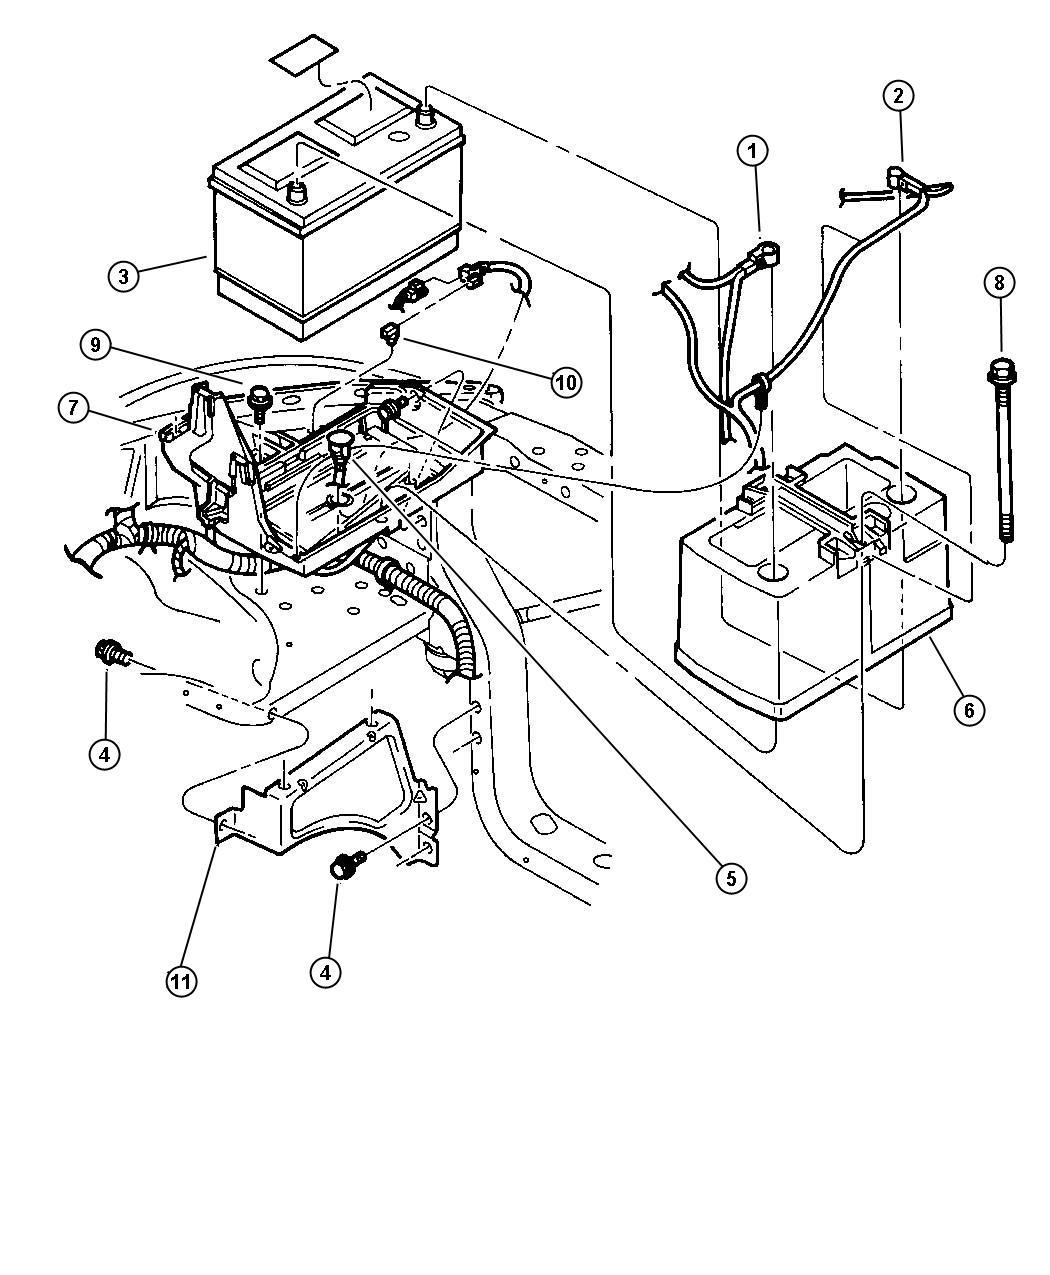 Dodge Durango Electrical Parts Diagram